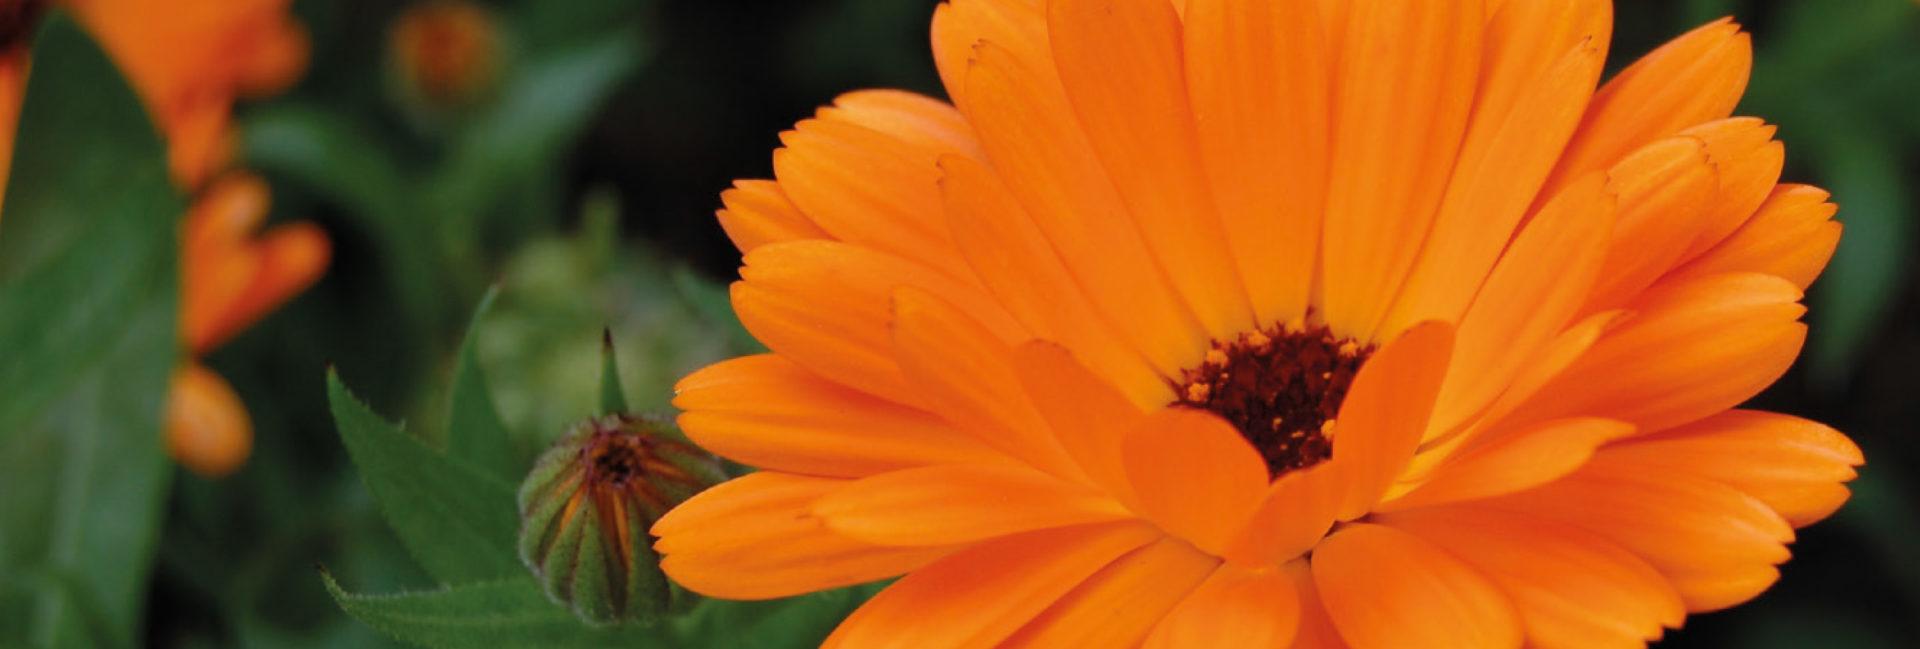 Calendula - Praxis für Homöopathie MONIKA JAEGER